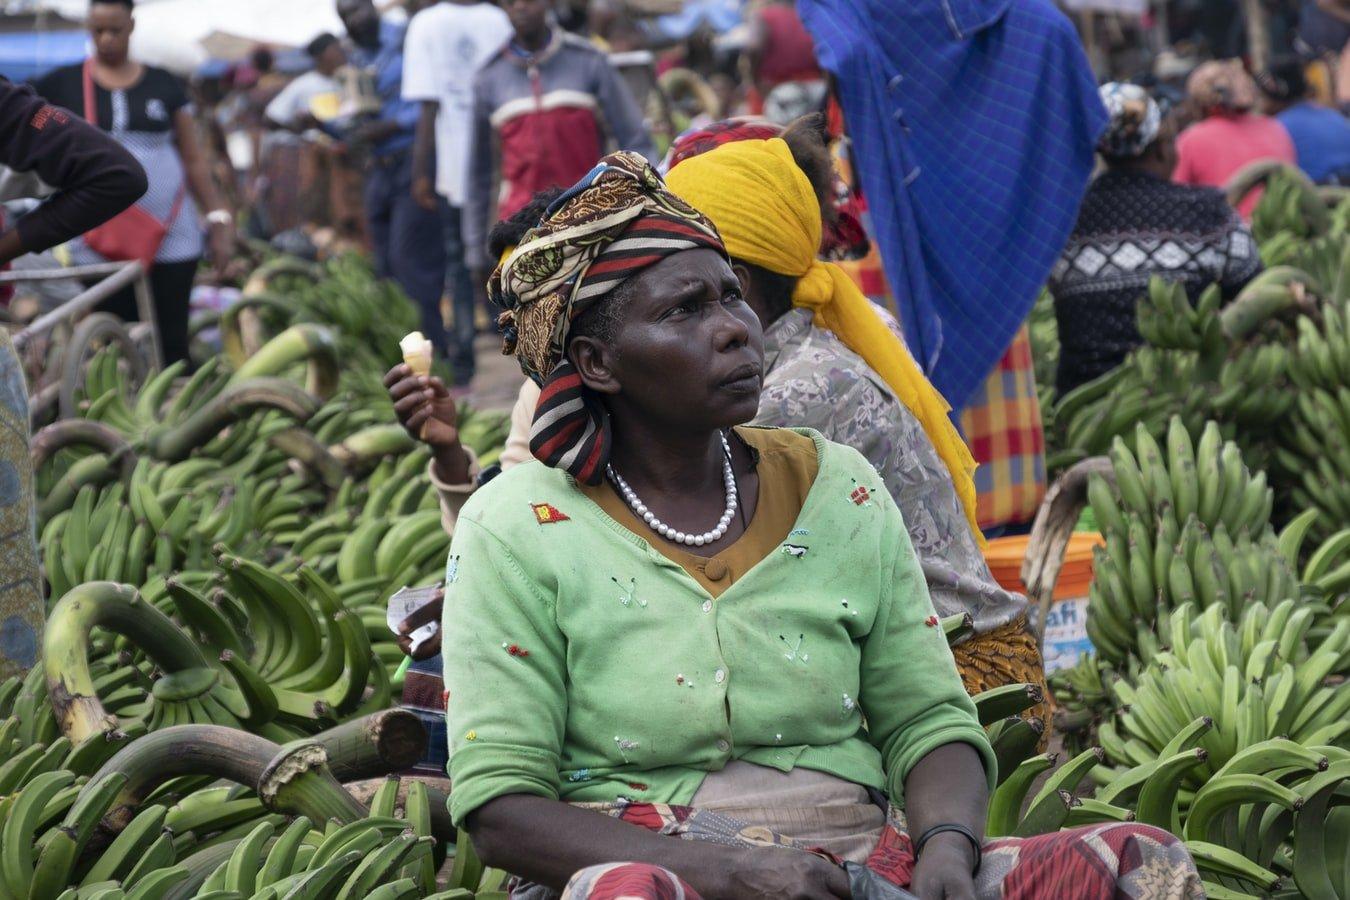 Marktfrau verkauft Bananen in Tansania